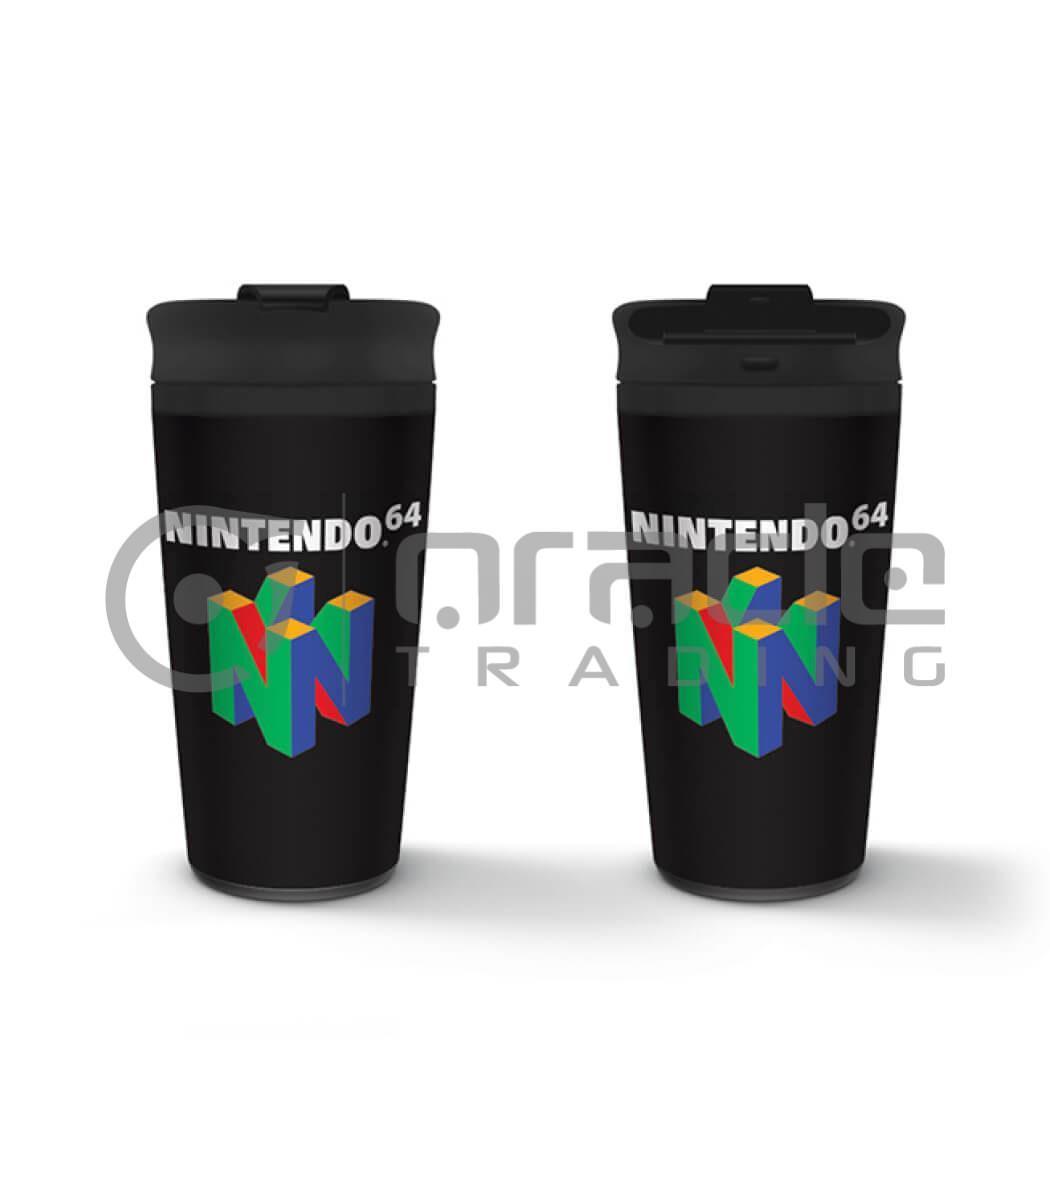 Nintendo N64 Metal Travel Mug